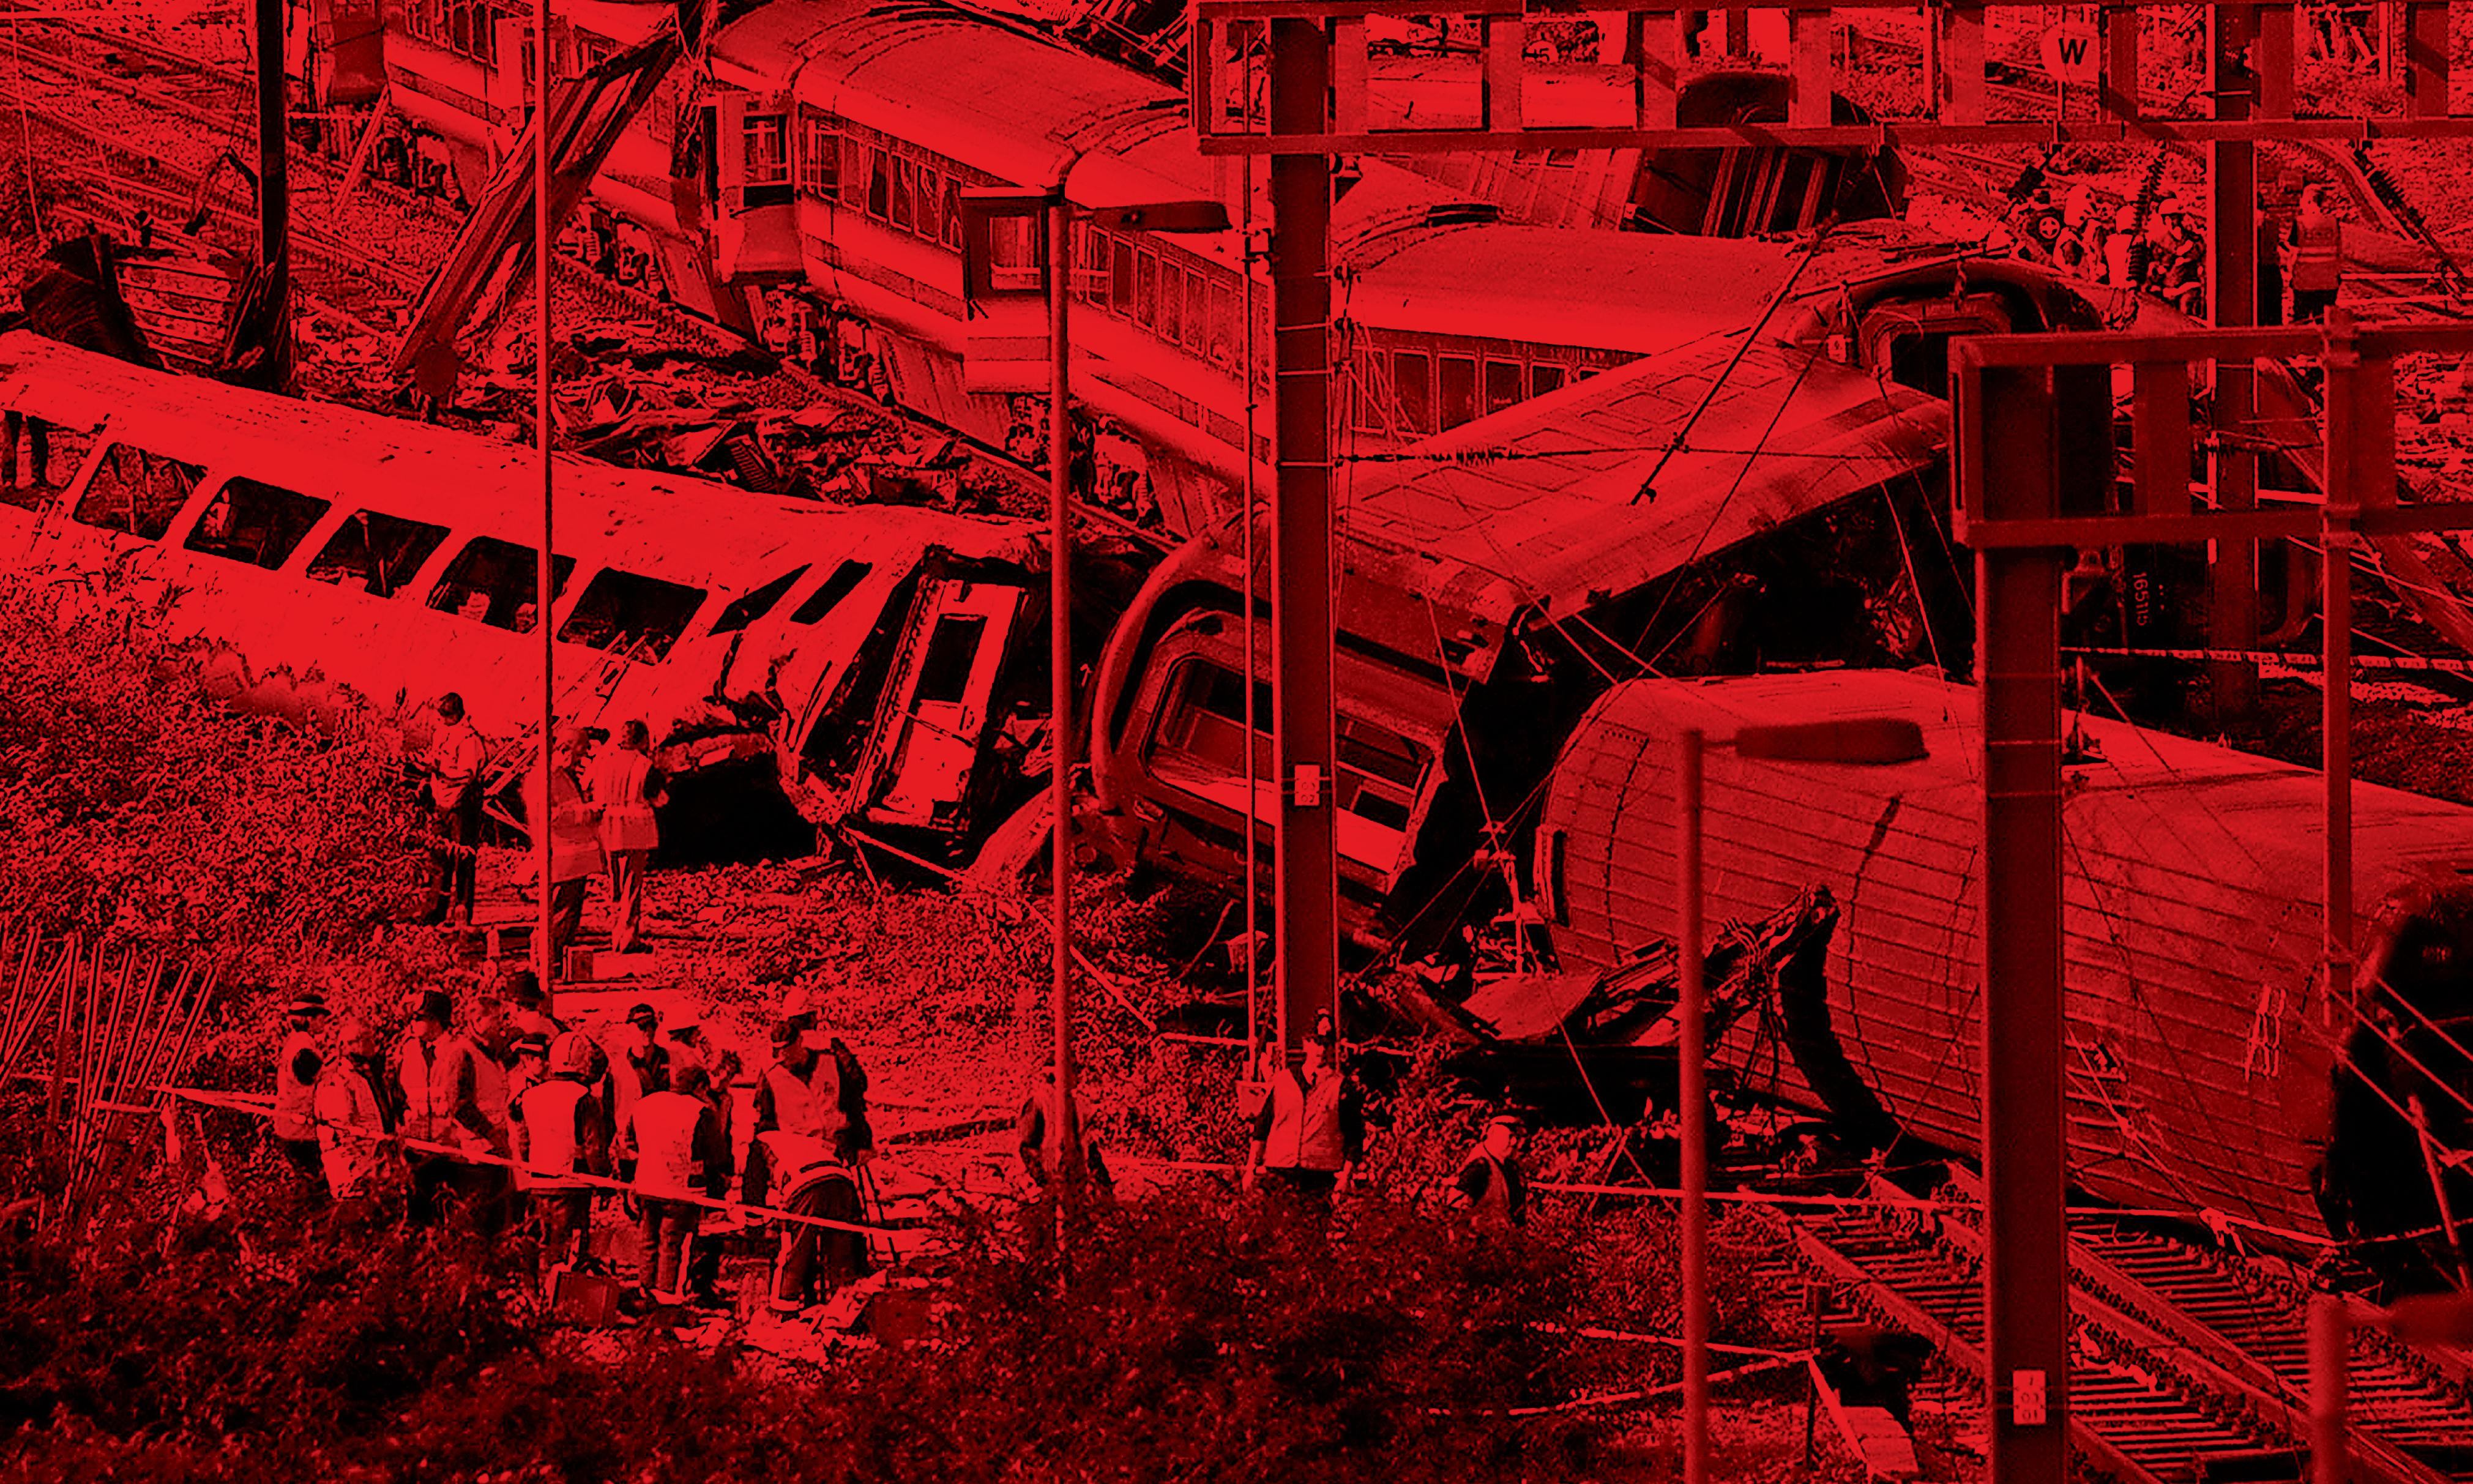 'A body drifted past the window': surviving the Ladbroke Grove train crash